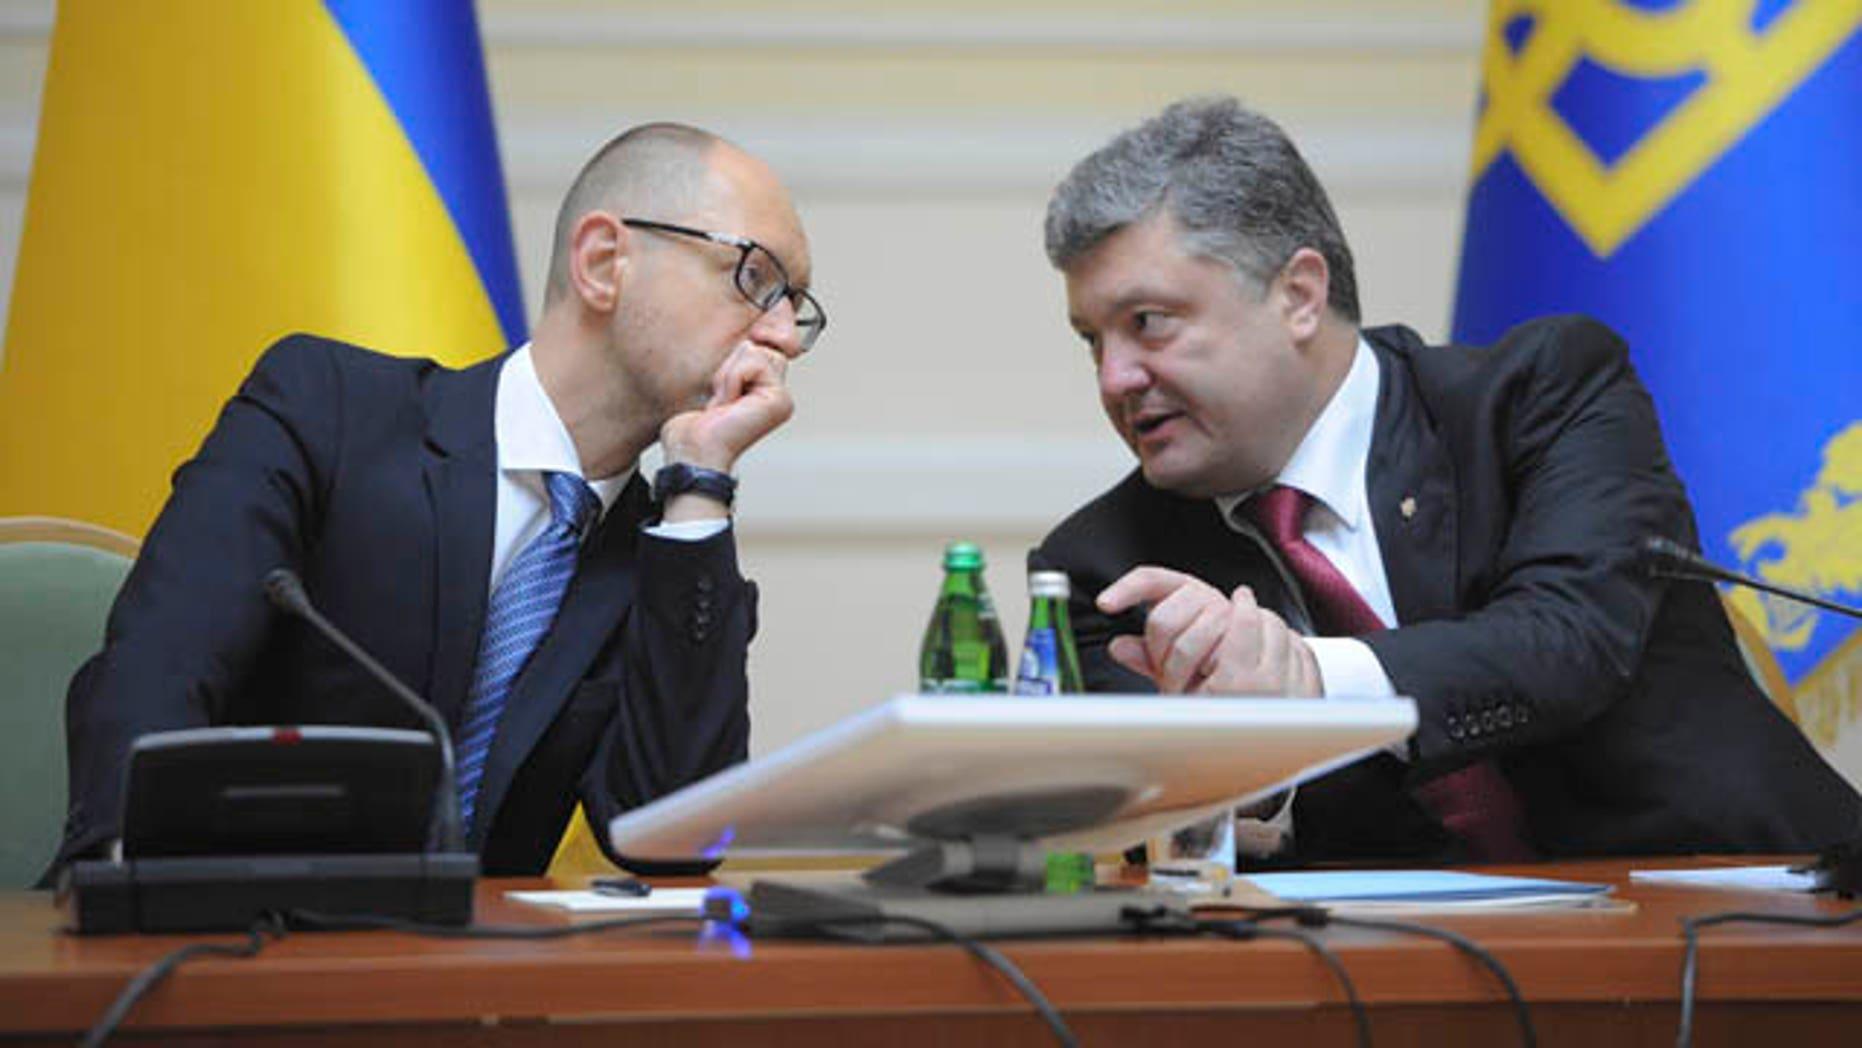 September 10, 2014: Ukrainian President Petro Poroshenko, right, talks with Prime Minister Arseniy Yatsenyuk in Kiev, Ukraine. (AP Photo/Andrew Kravchenko, Pool)